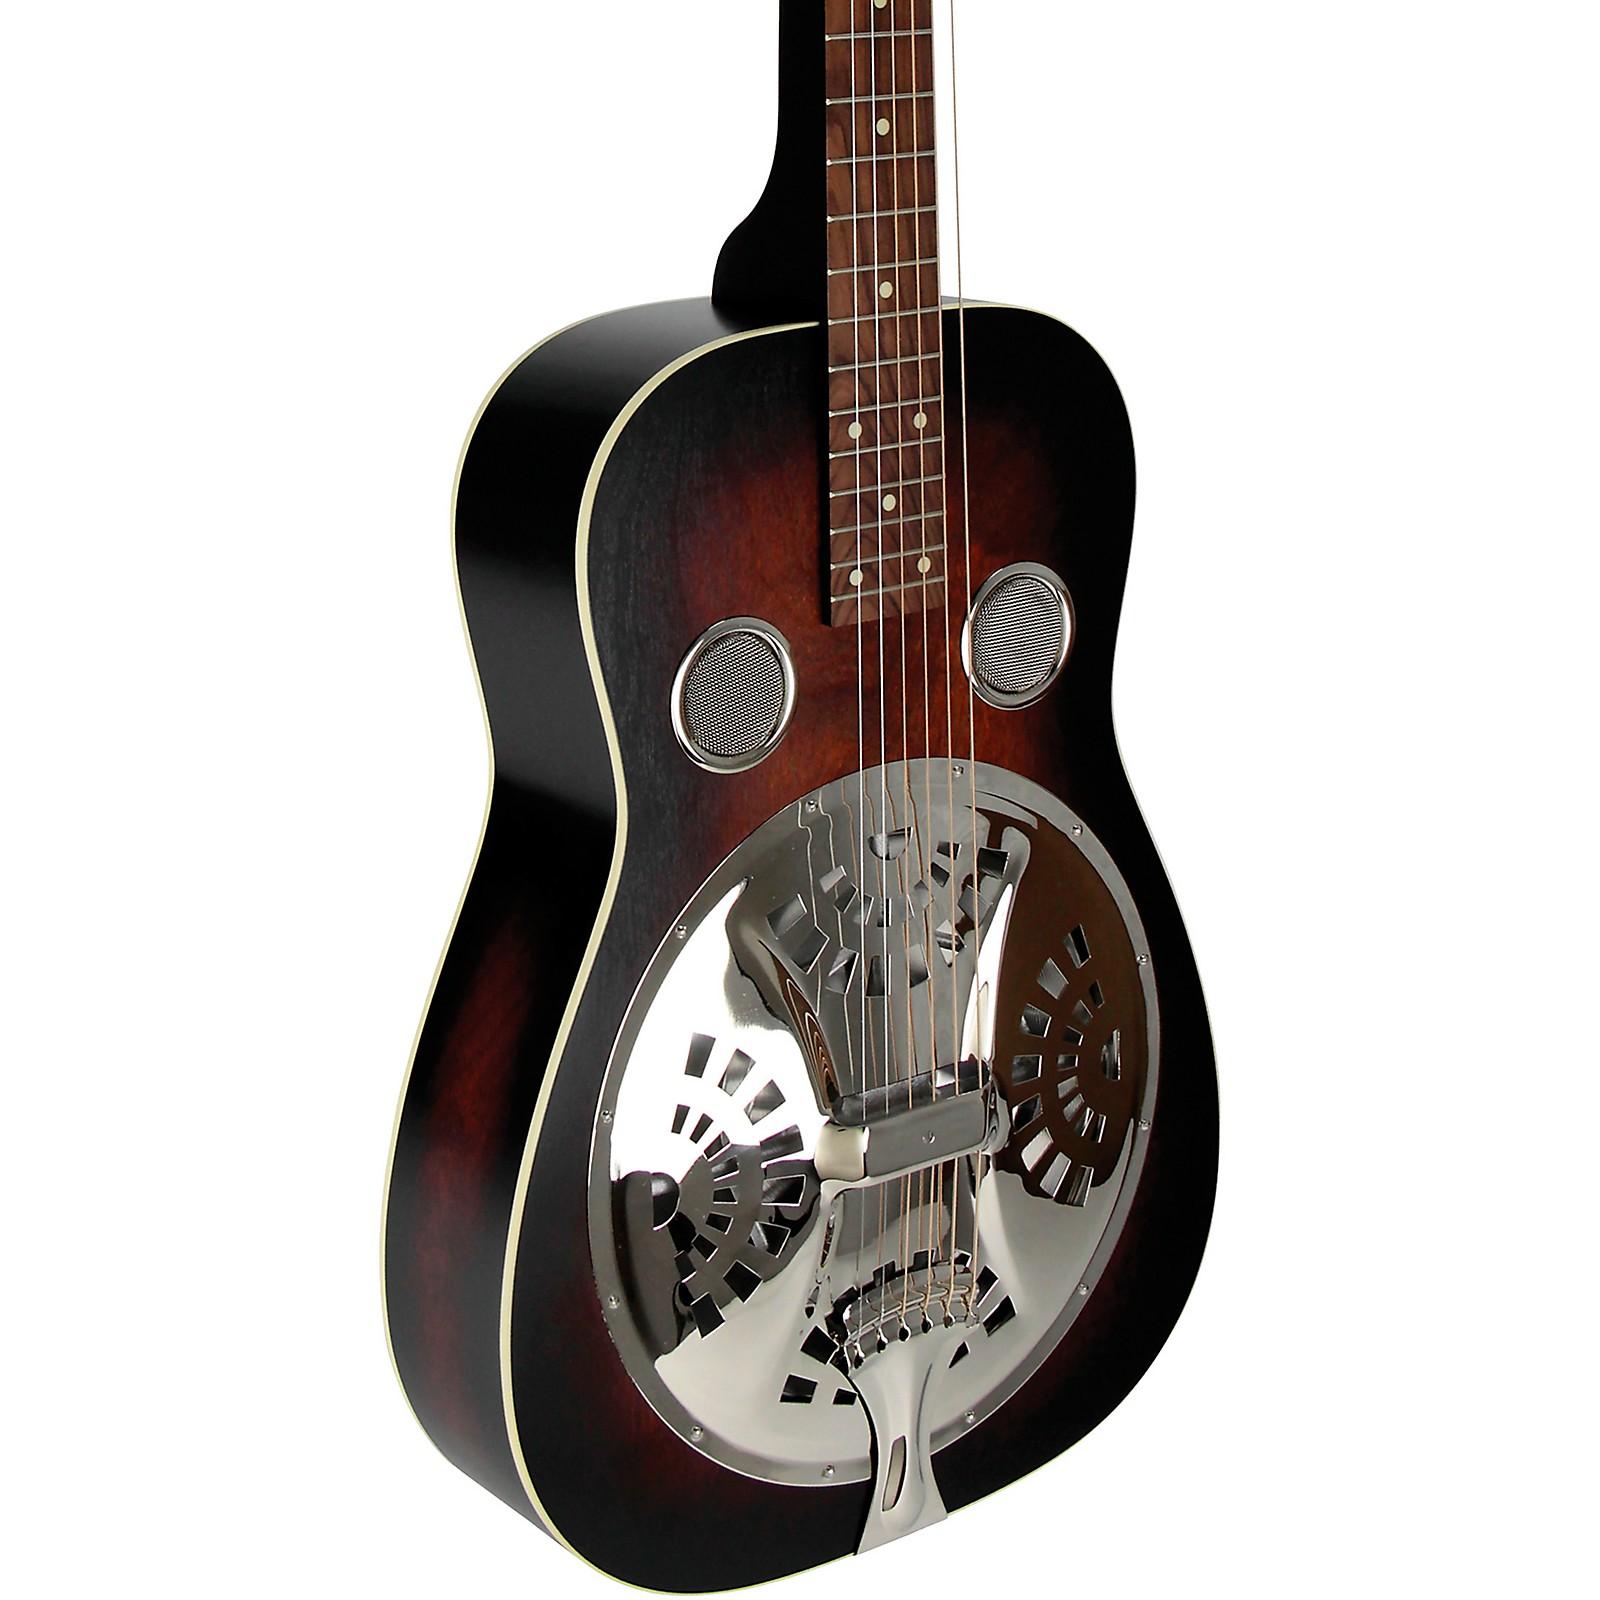 Beard Guitars Deco Phonic Model 57 Squareneck Left-Handed Acoustic-Electric Resonator Guitar